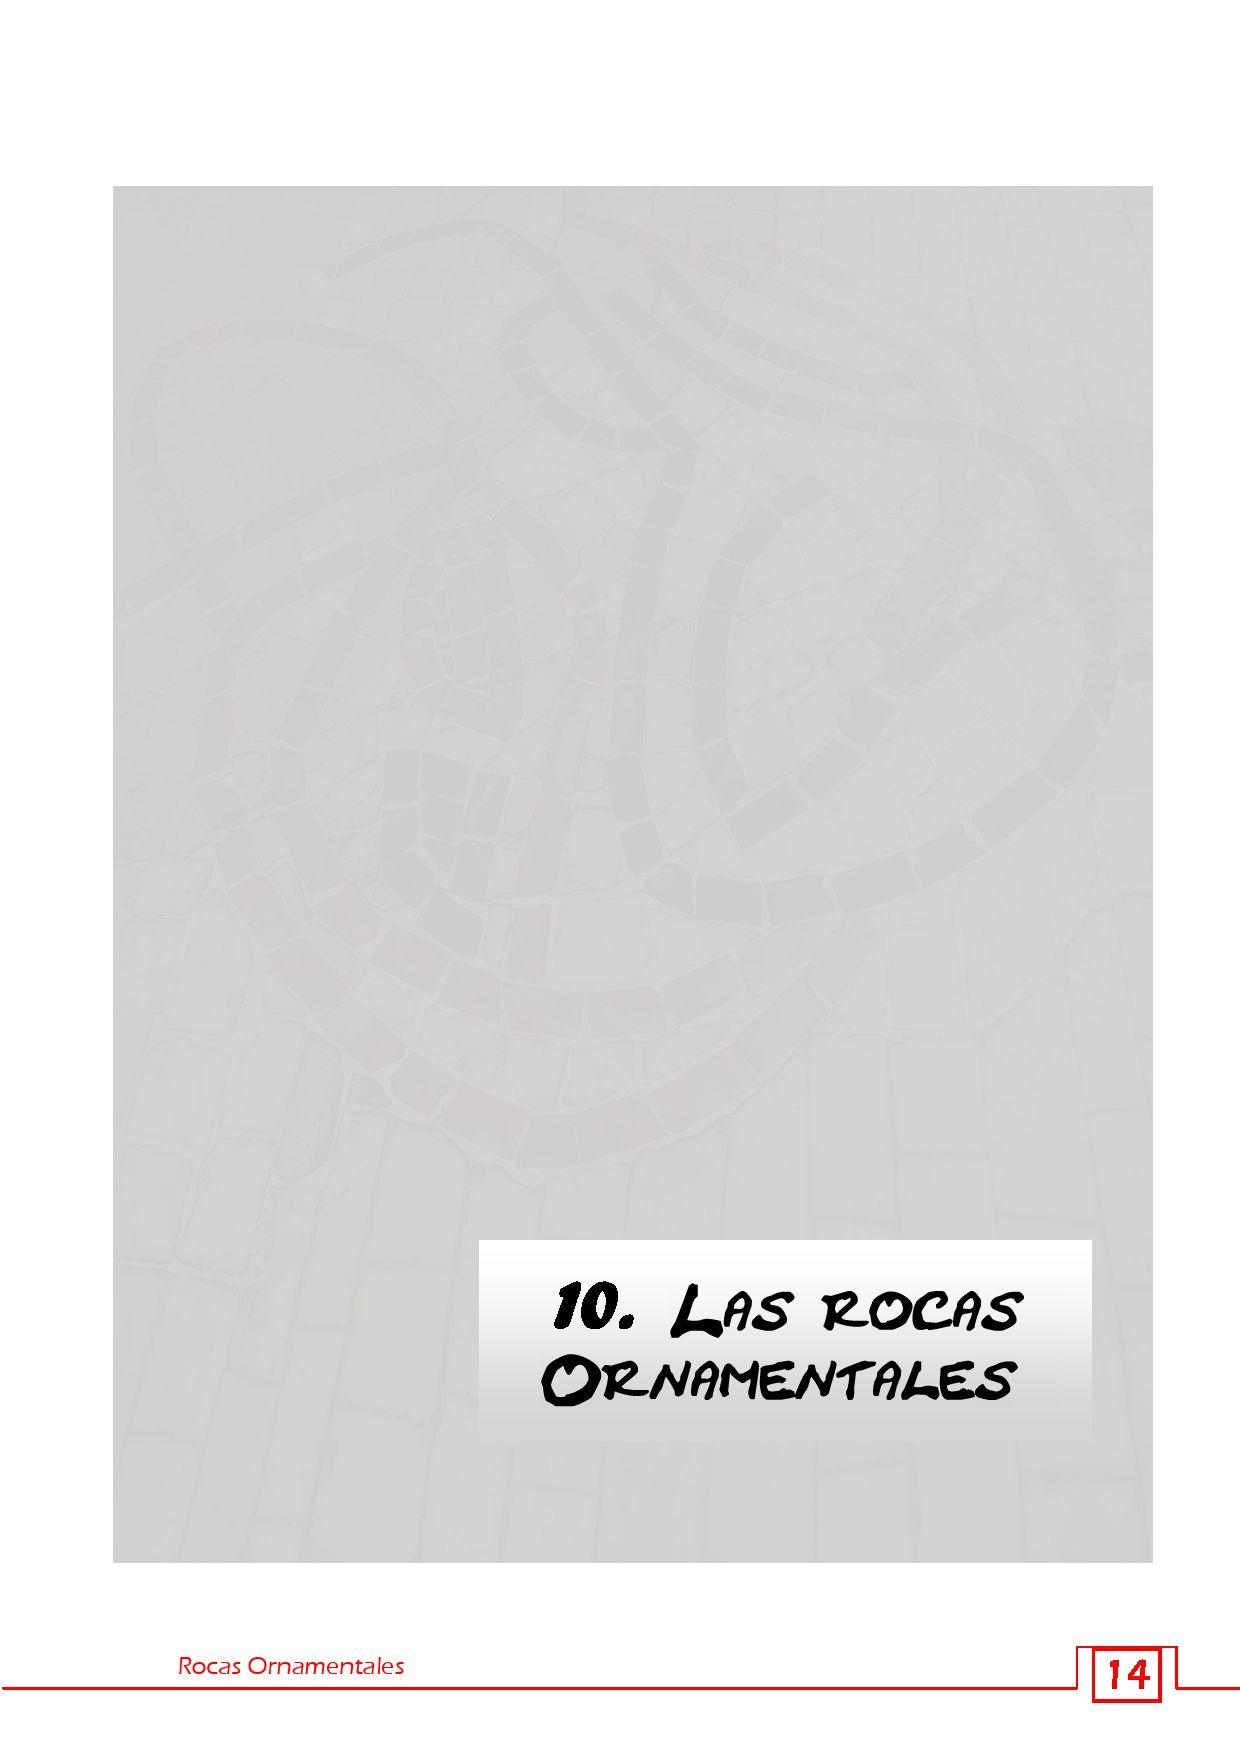 Rocas ornamentales by esther fernandez issuu for Formas ornamentales